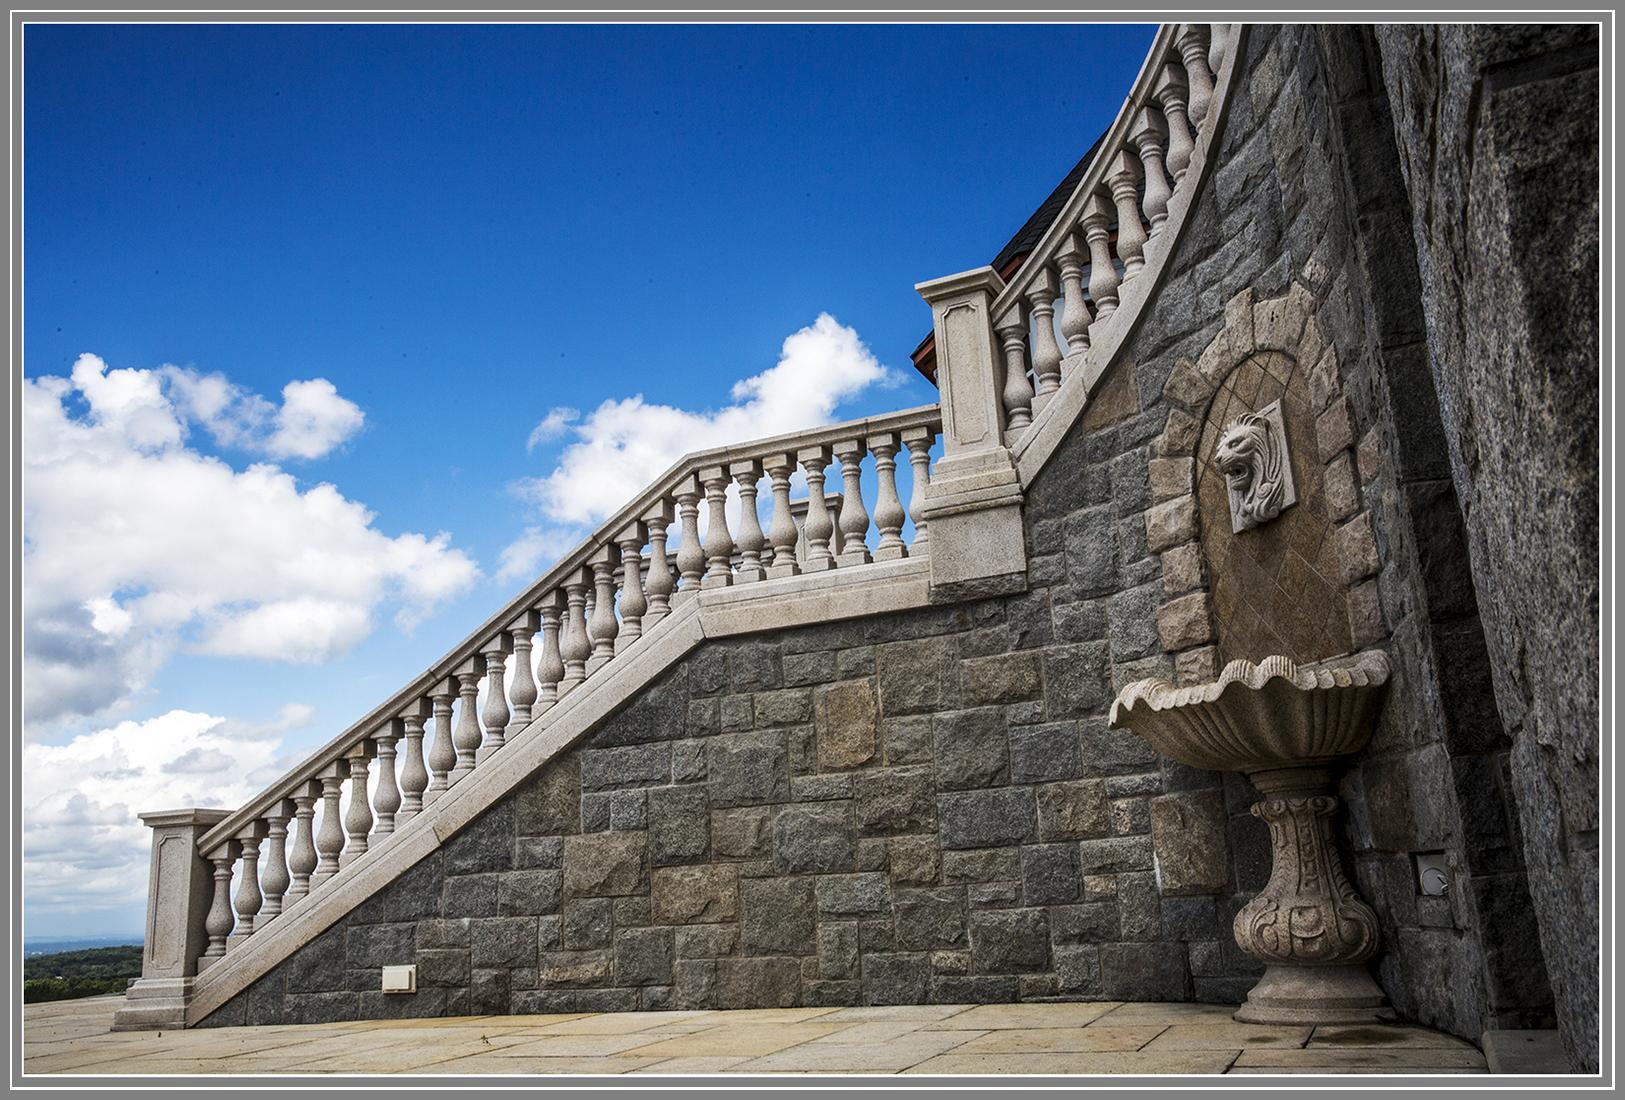 Stone masonry by Artistic Outdoors